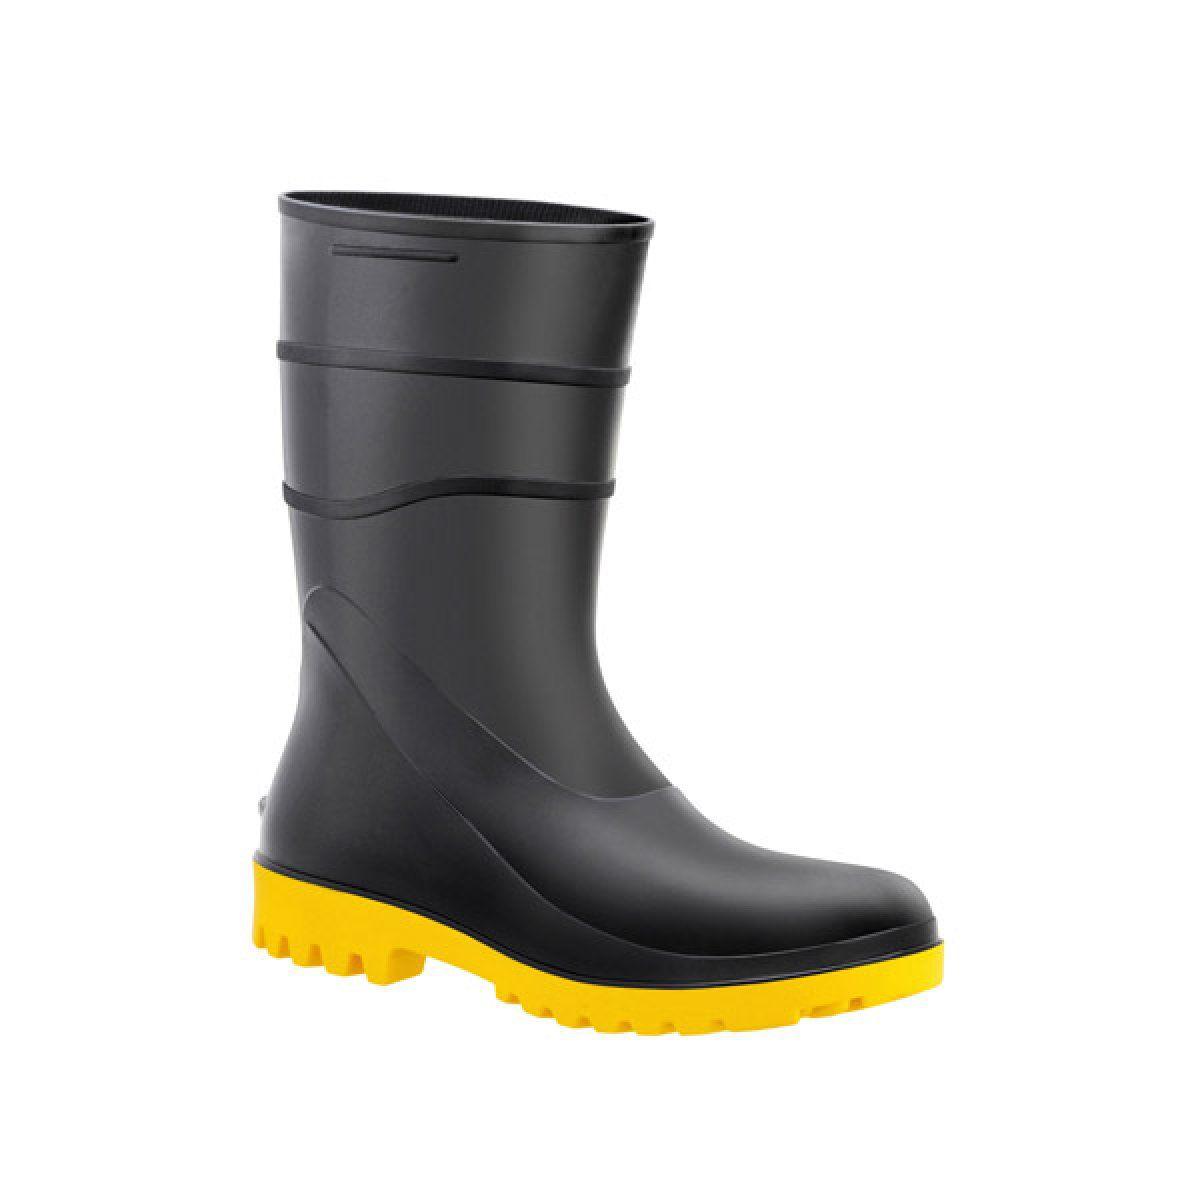 Bota de PVC Preta c/ Solado Amarelo N°34 - BRACOL